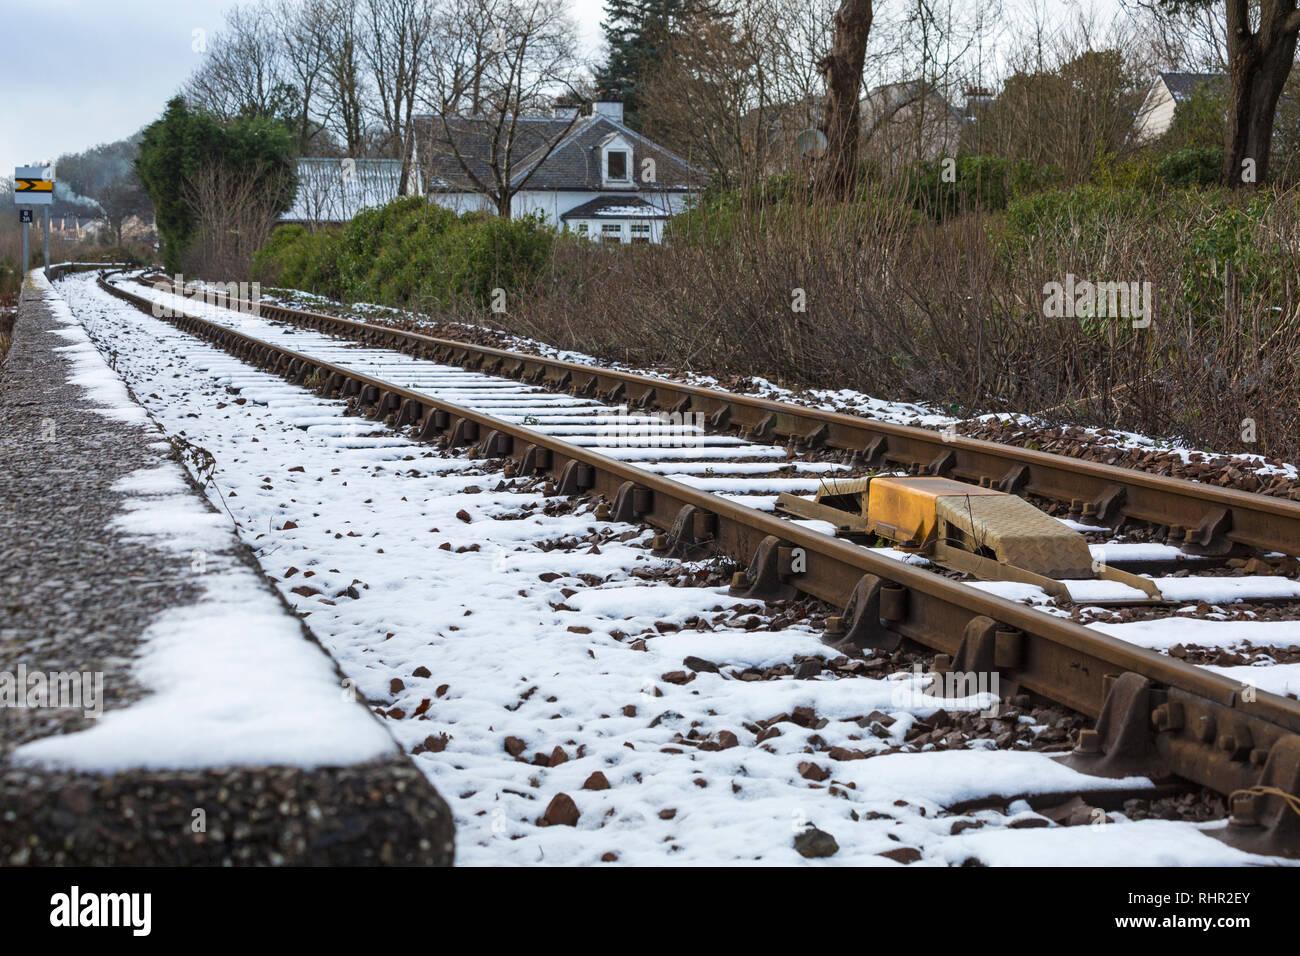 Snow on the railway tracks at Corpach, Fort William, Scotland in winter - railway track, rail track tracks, train tracks, railroad tracks - Stock Image